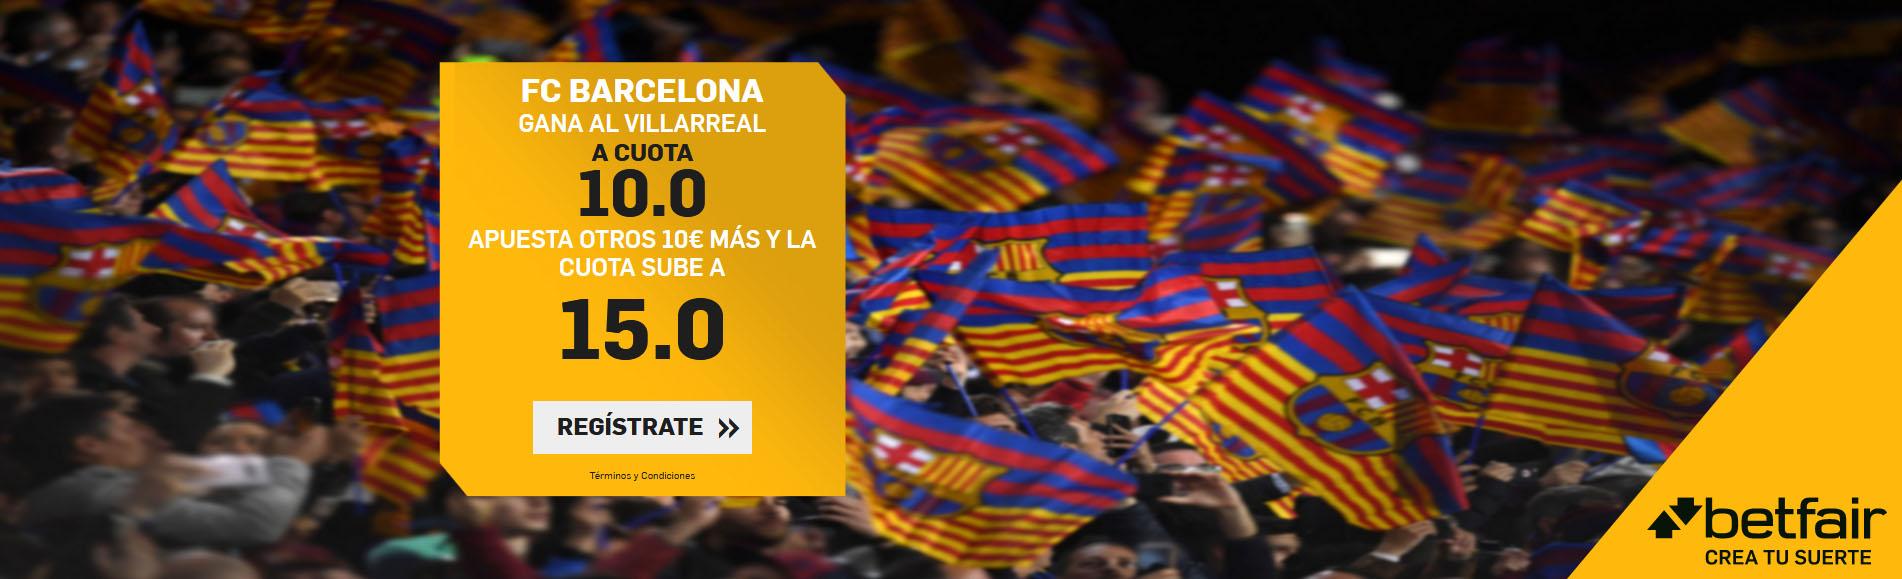 Barcelona gana al Villarreal